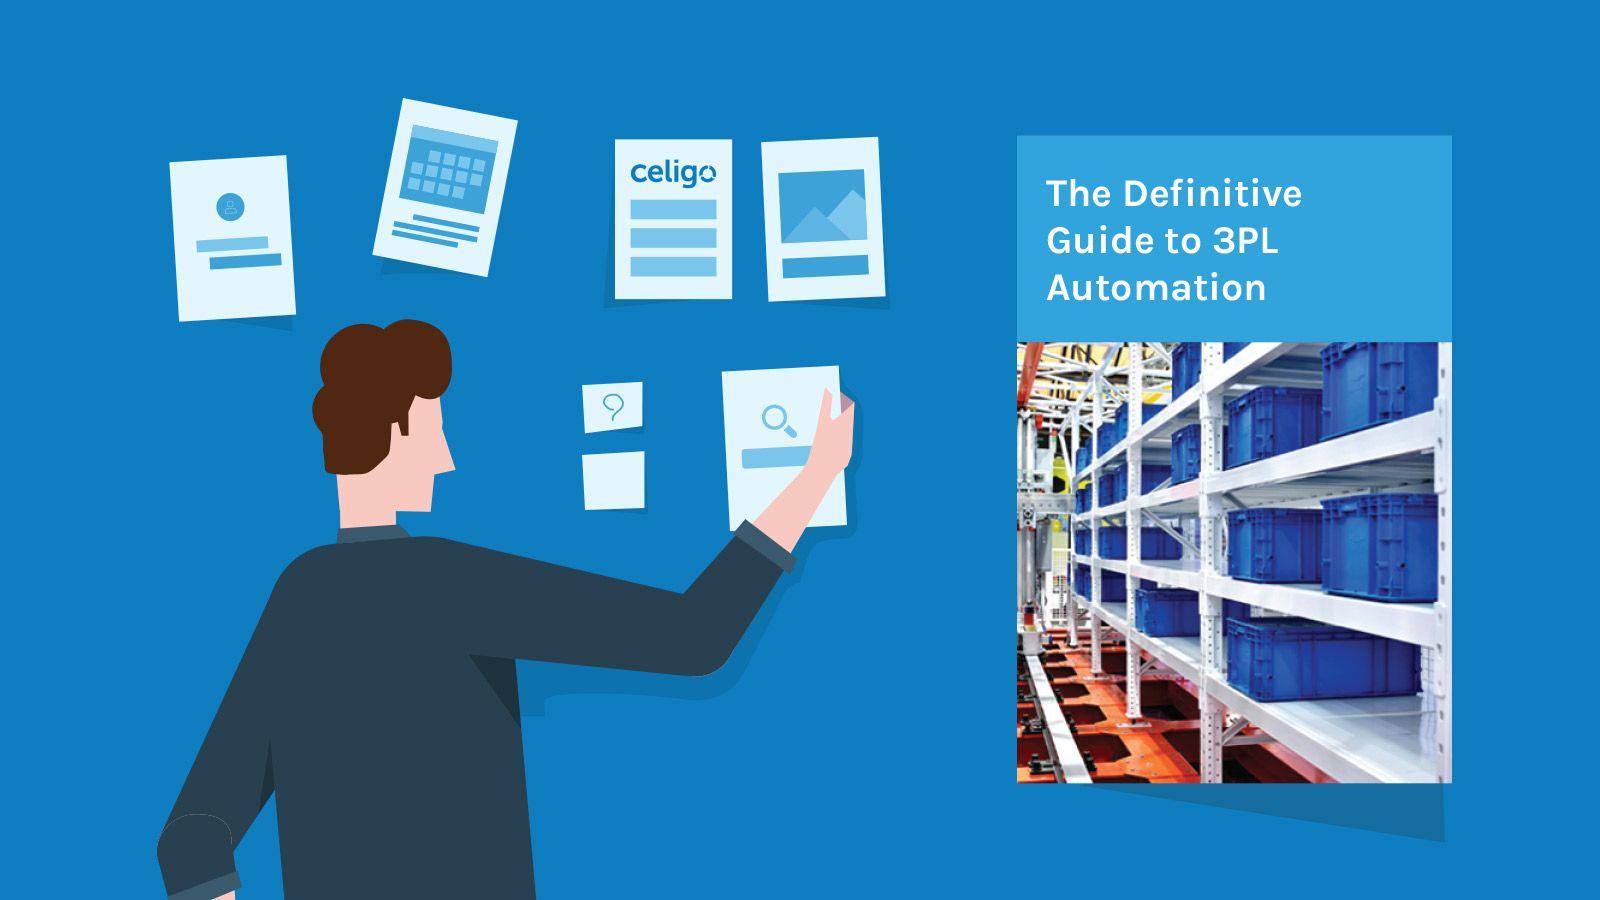 8 Takeaways from Celigo's Report on 3PL Automation